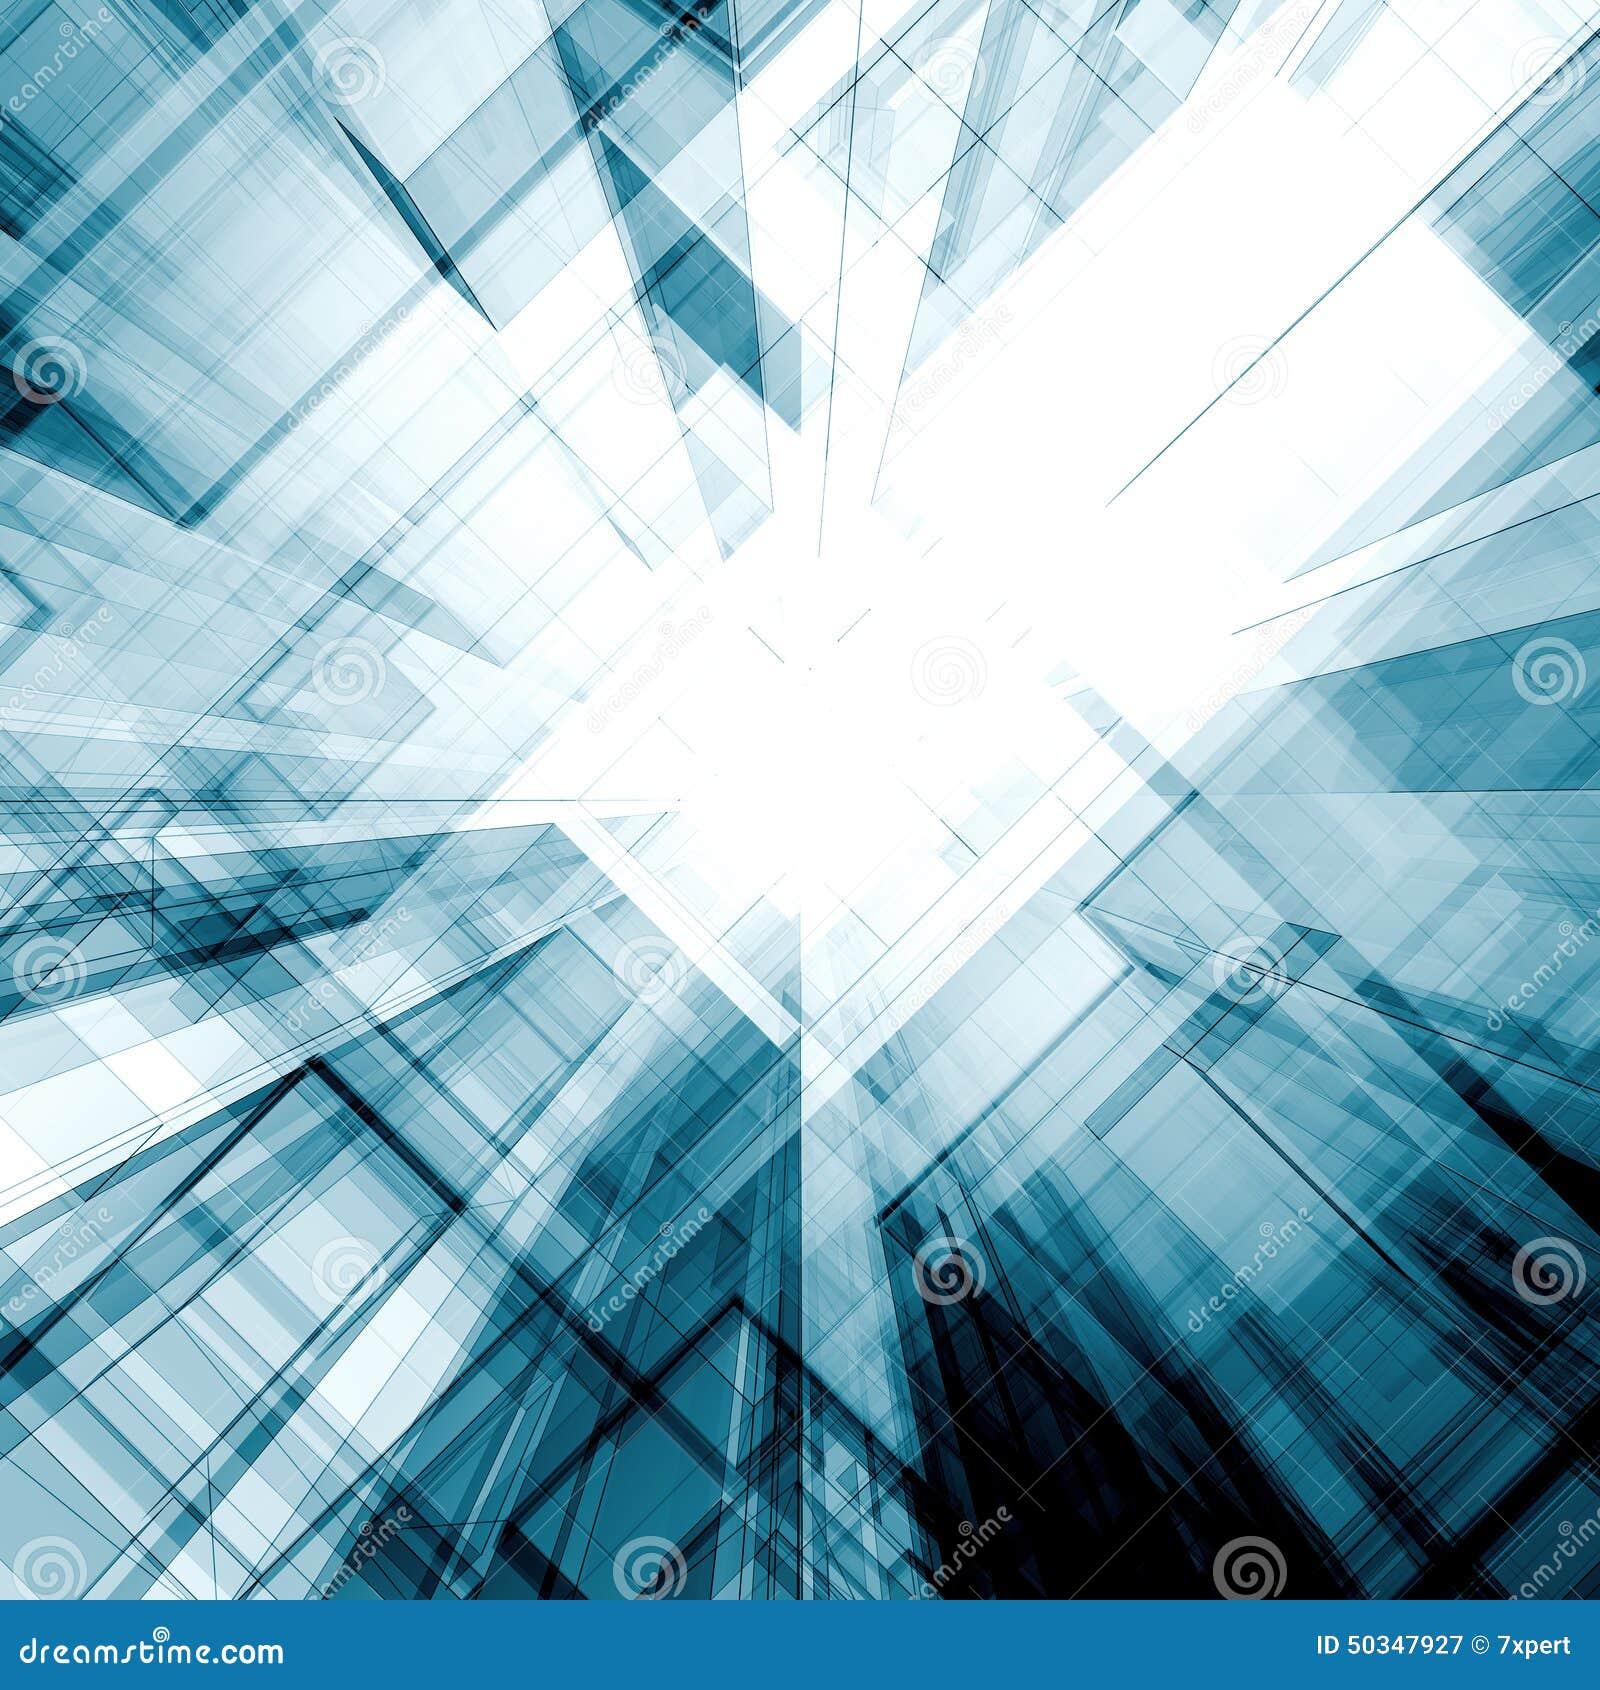 Picture Book Illustration Making An Architectural Model: Futuristic Concept Stock Illustration. Illustration Of